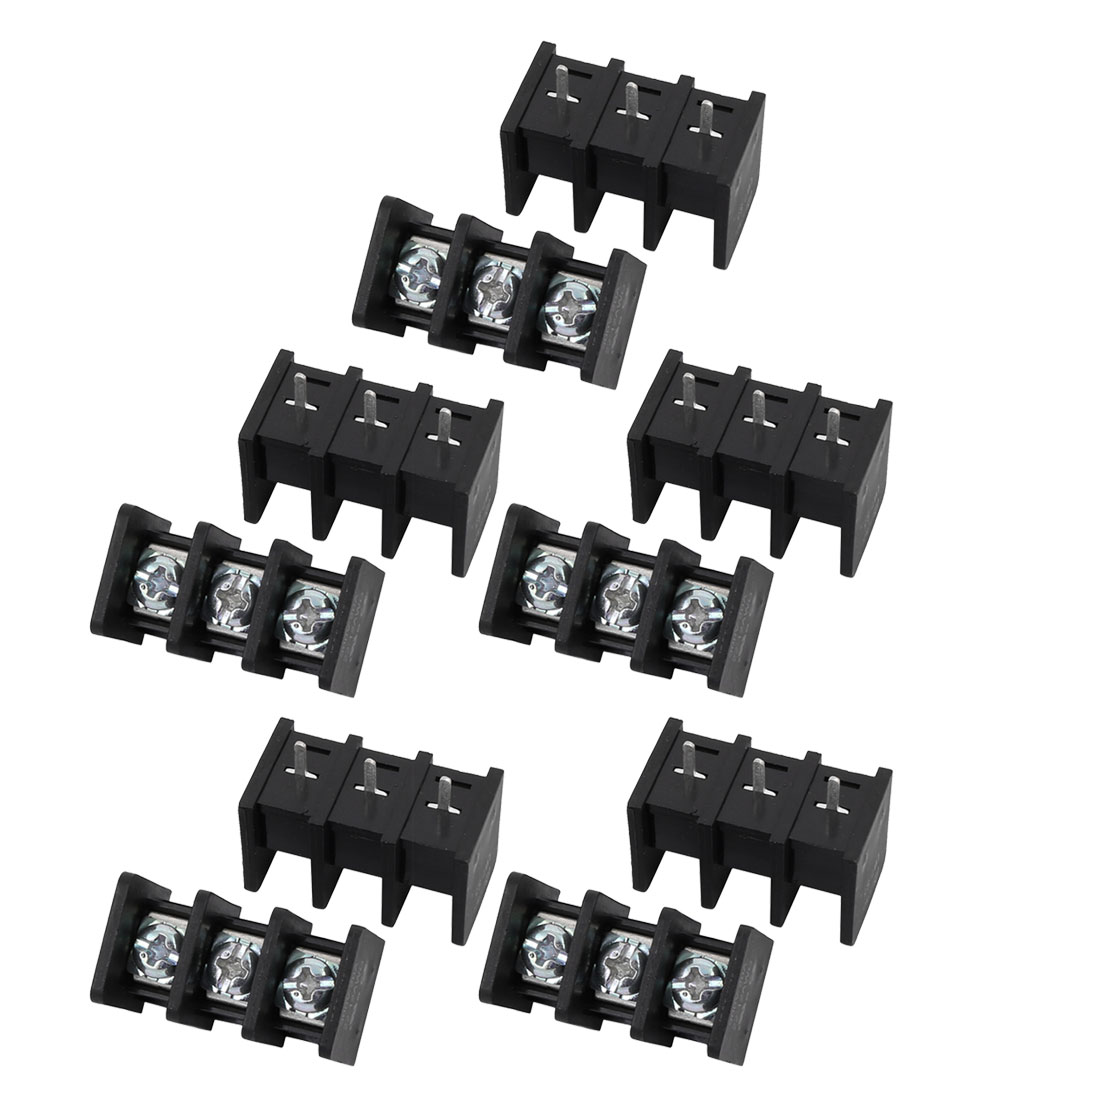 10Pcs LW1C AC 300V 20A 9.5mm Pitch 3P Screw Terminal Block Strip Barrier